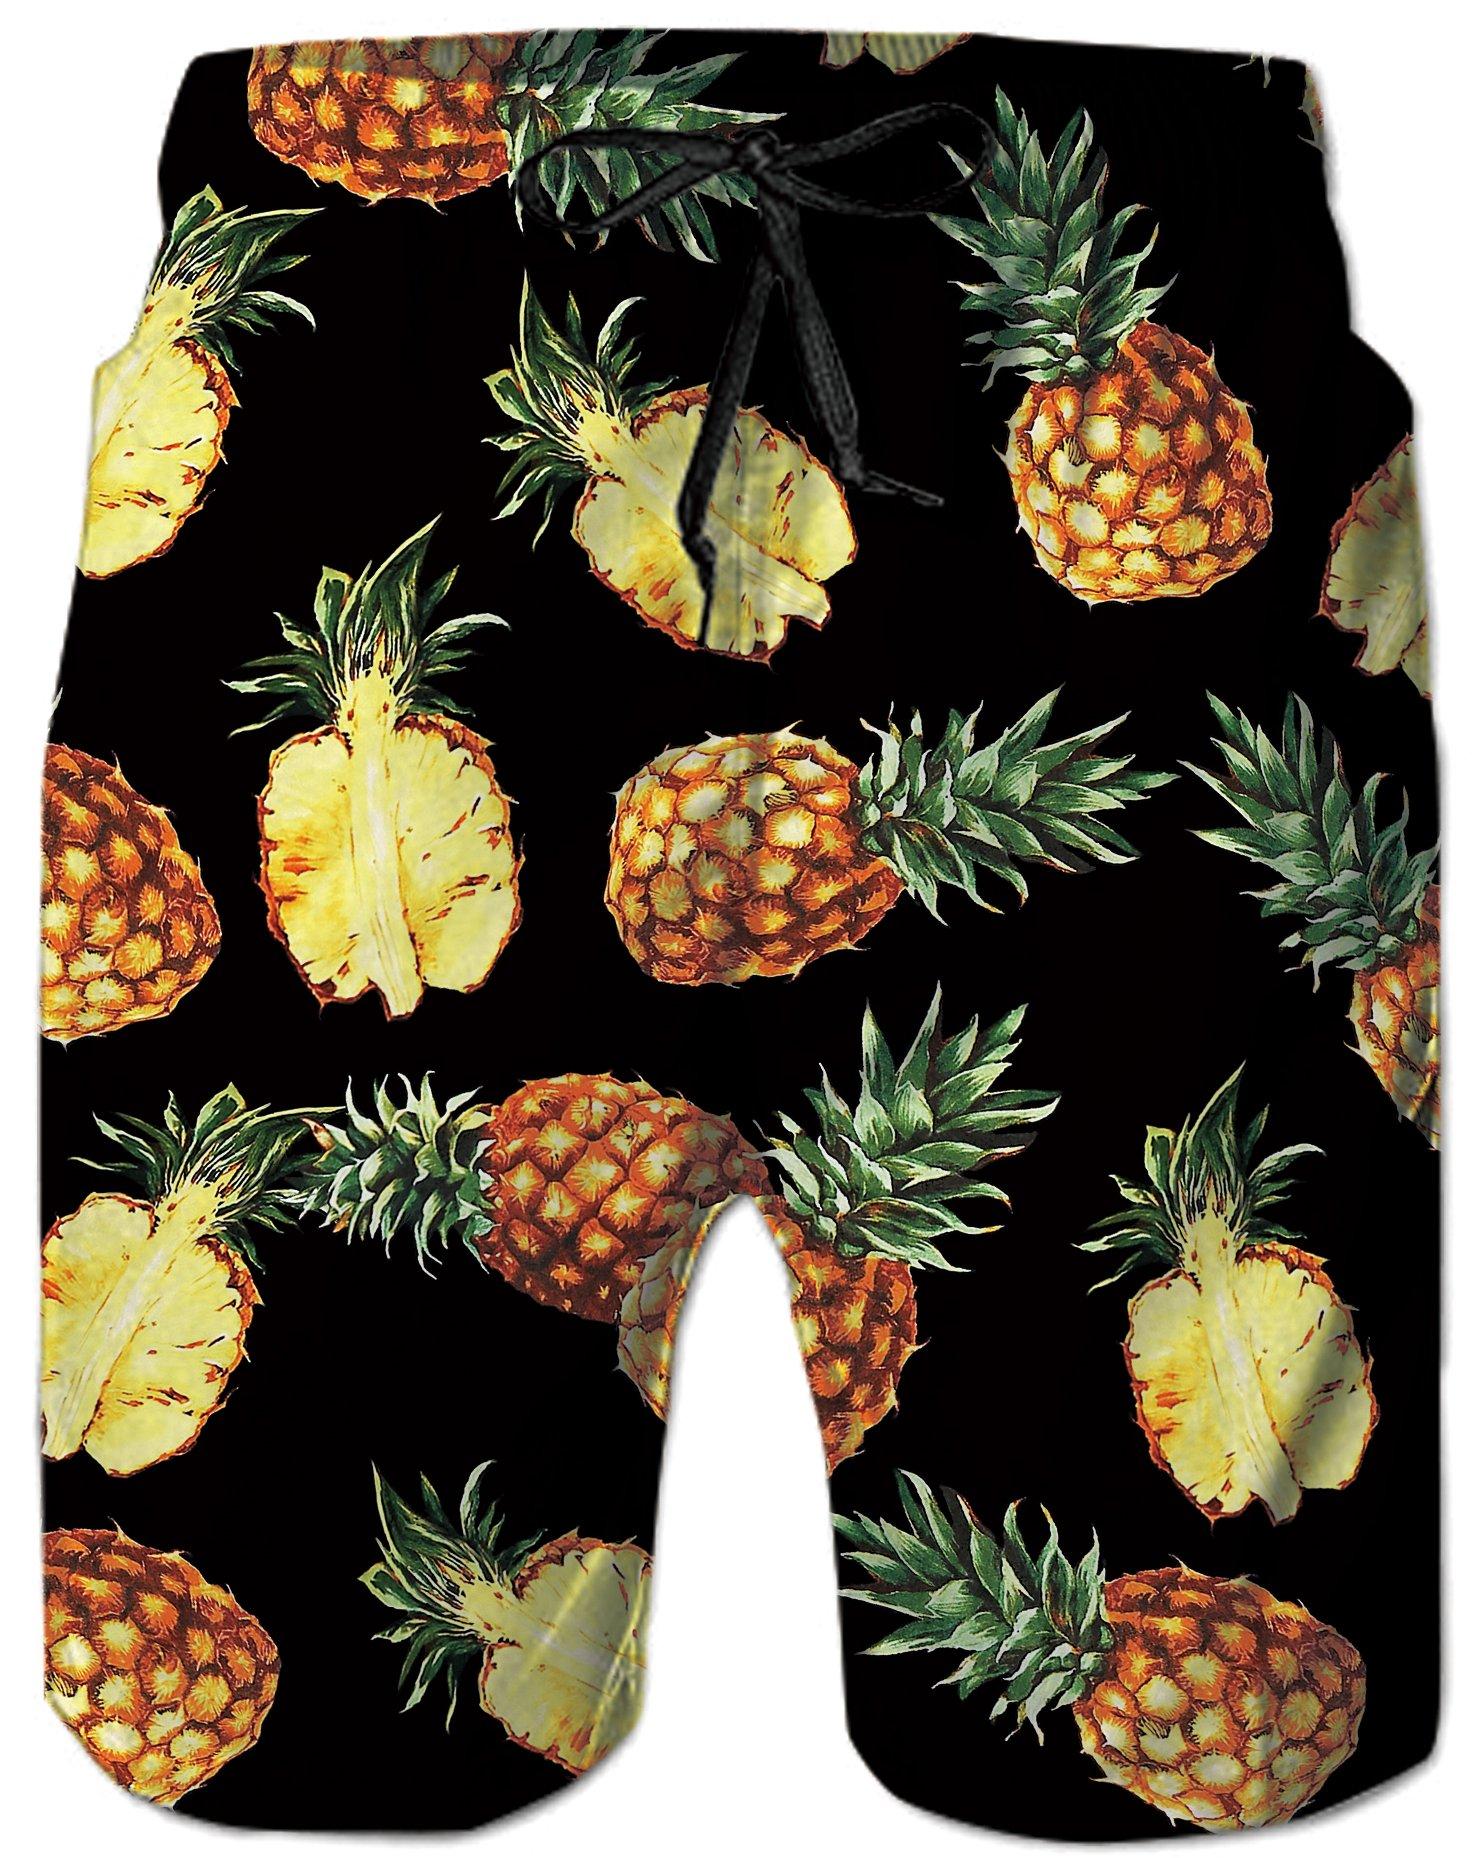 RAISEVERN Mens Pineapple 3D Print Summer Tropical Boardshorts Mesh Lining Quick Dry Holiday Hawaii Beach Shorts Side Pockets Athletic Swim Trunks